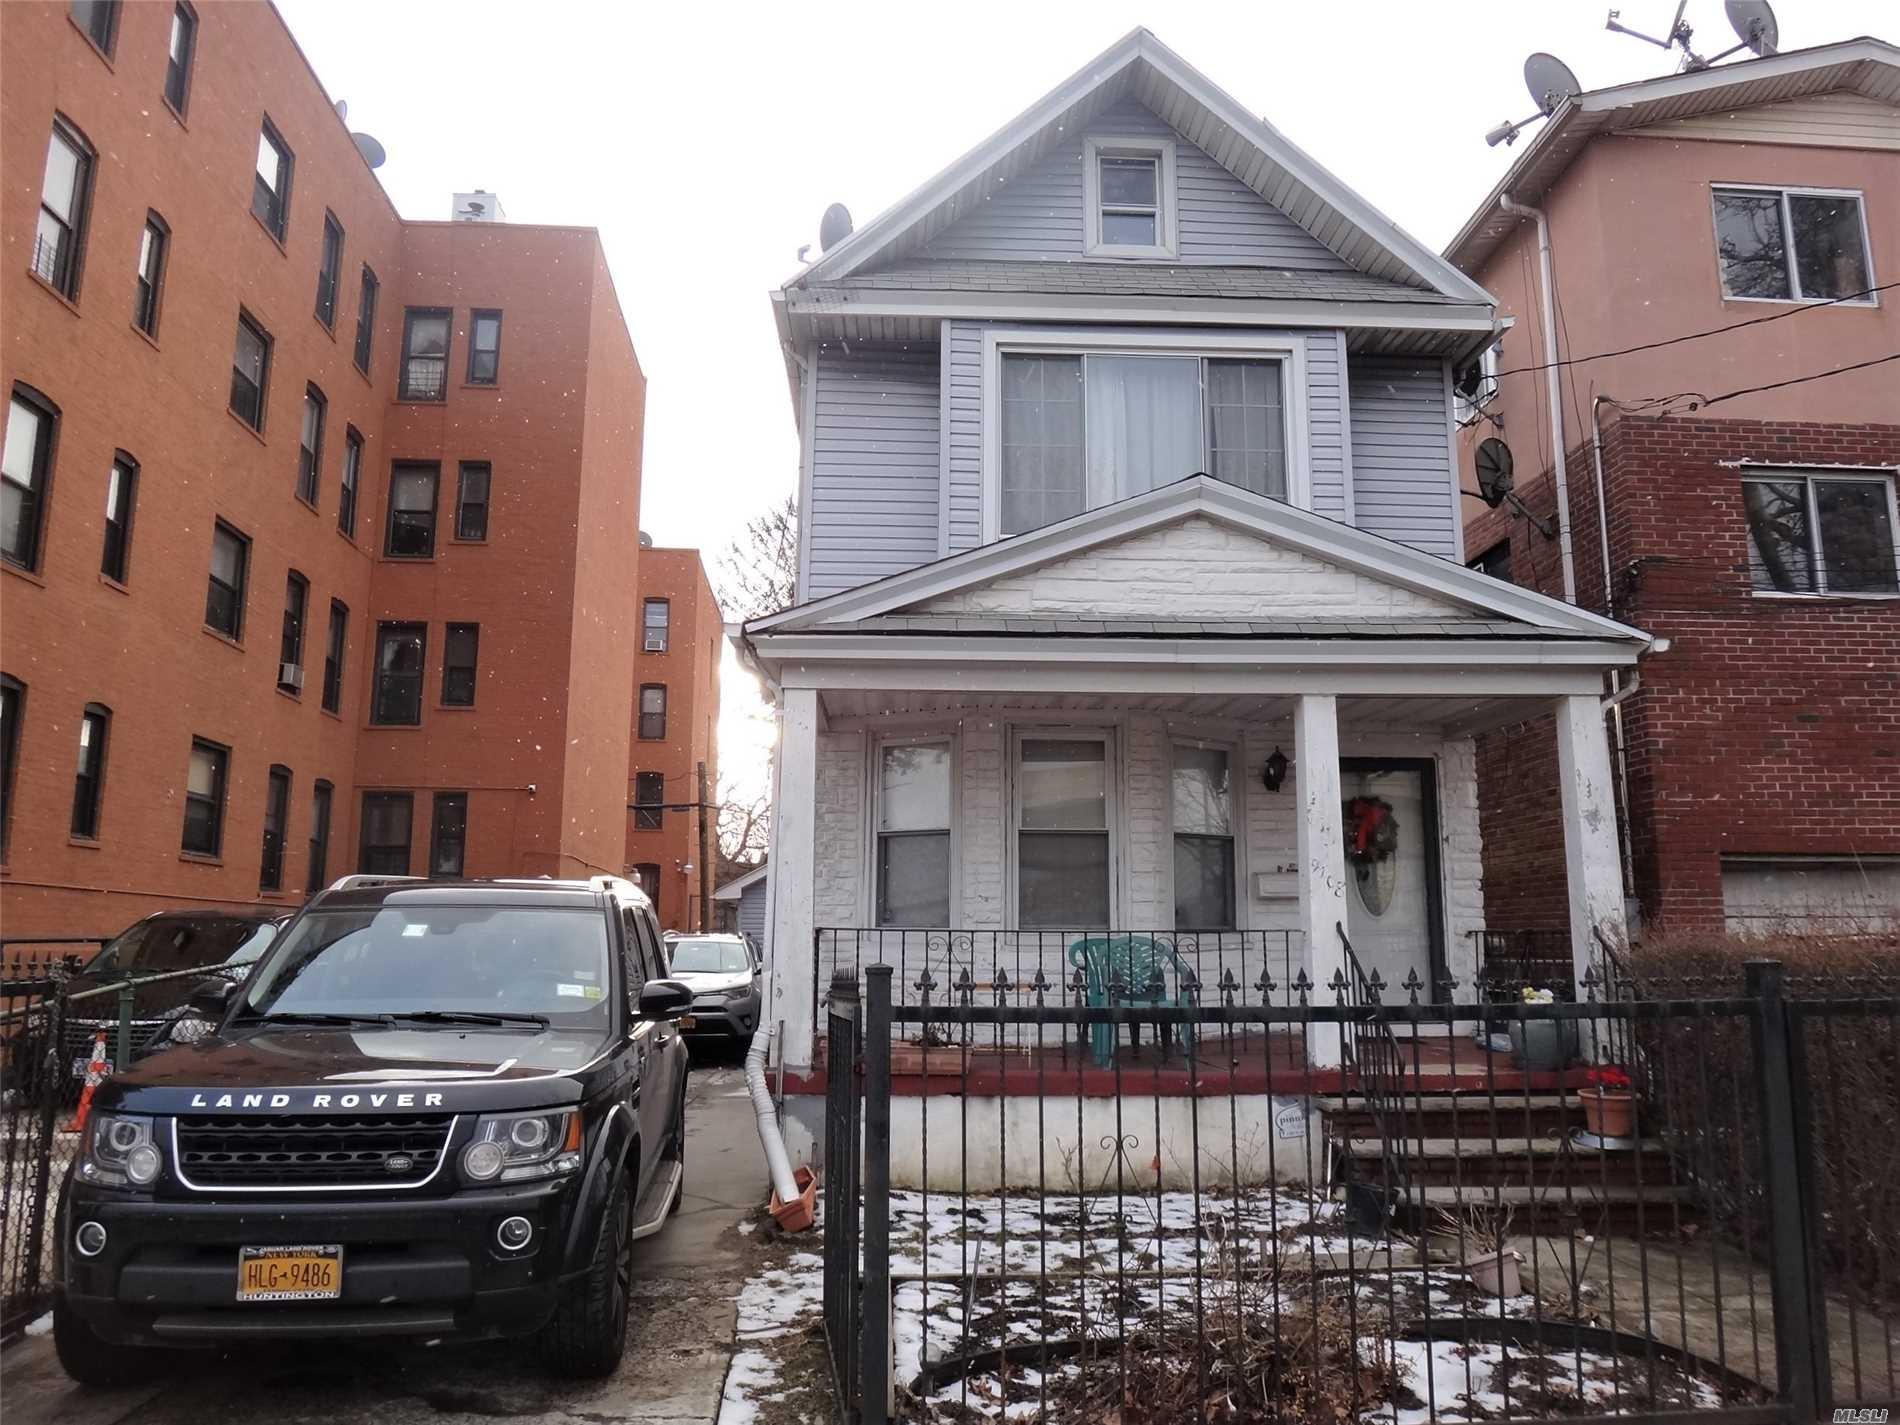 Property for sale at 97-08 Van Wyck Expressway, Richmond Hill NY 11419, Richmond Hill,  New York 11419